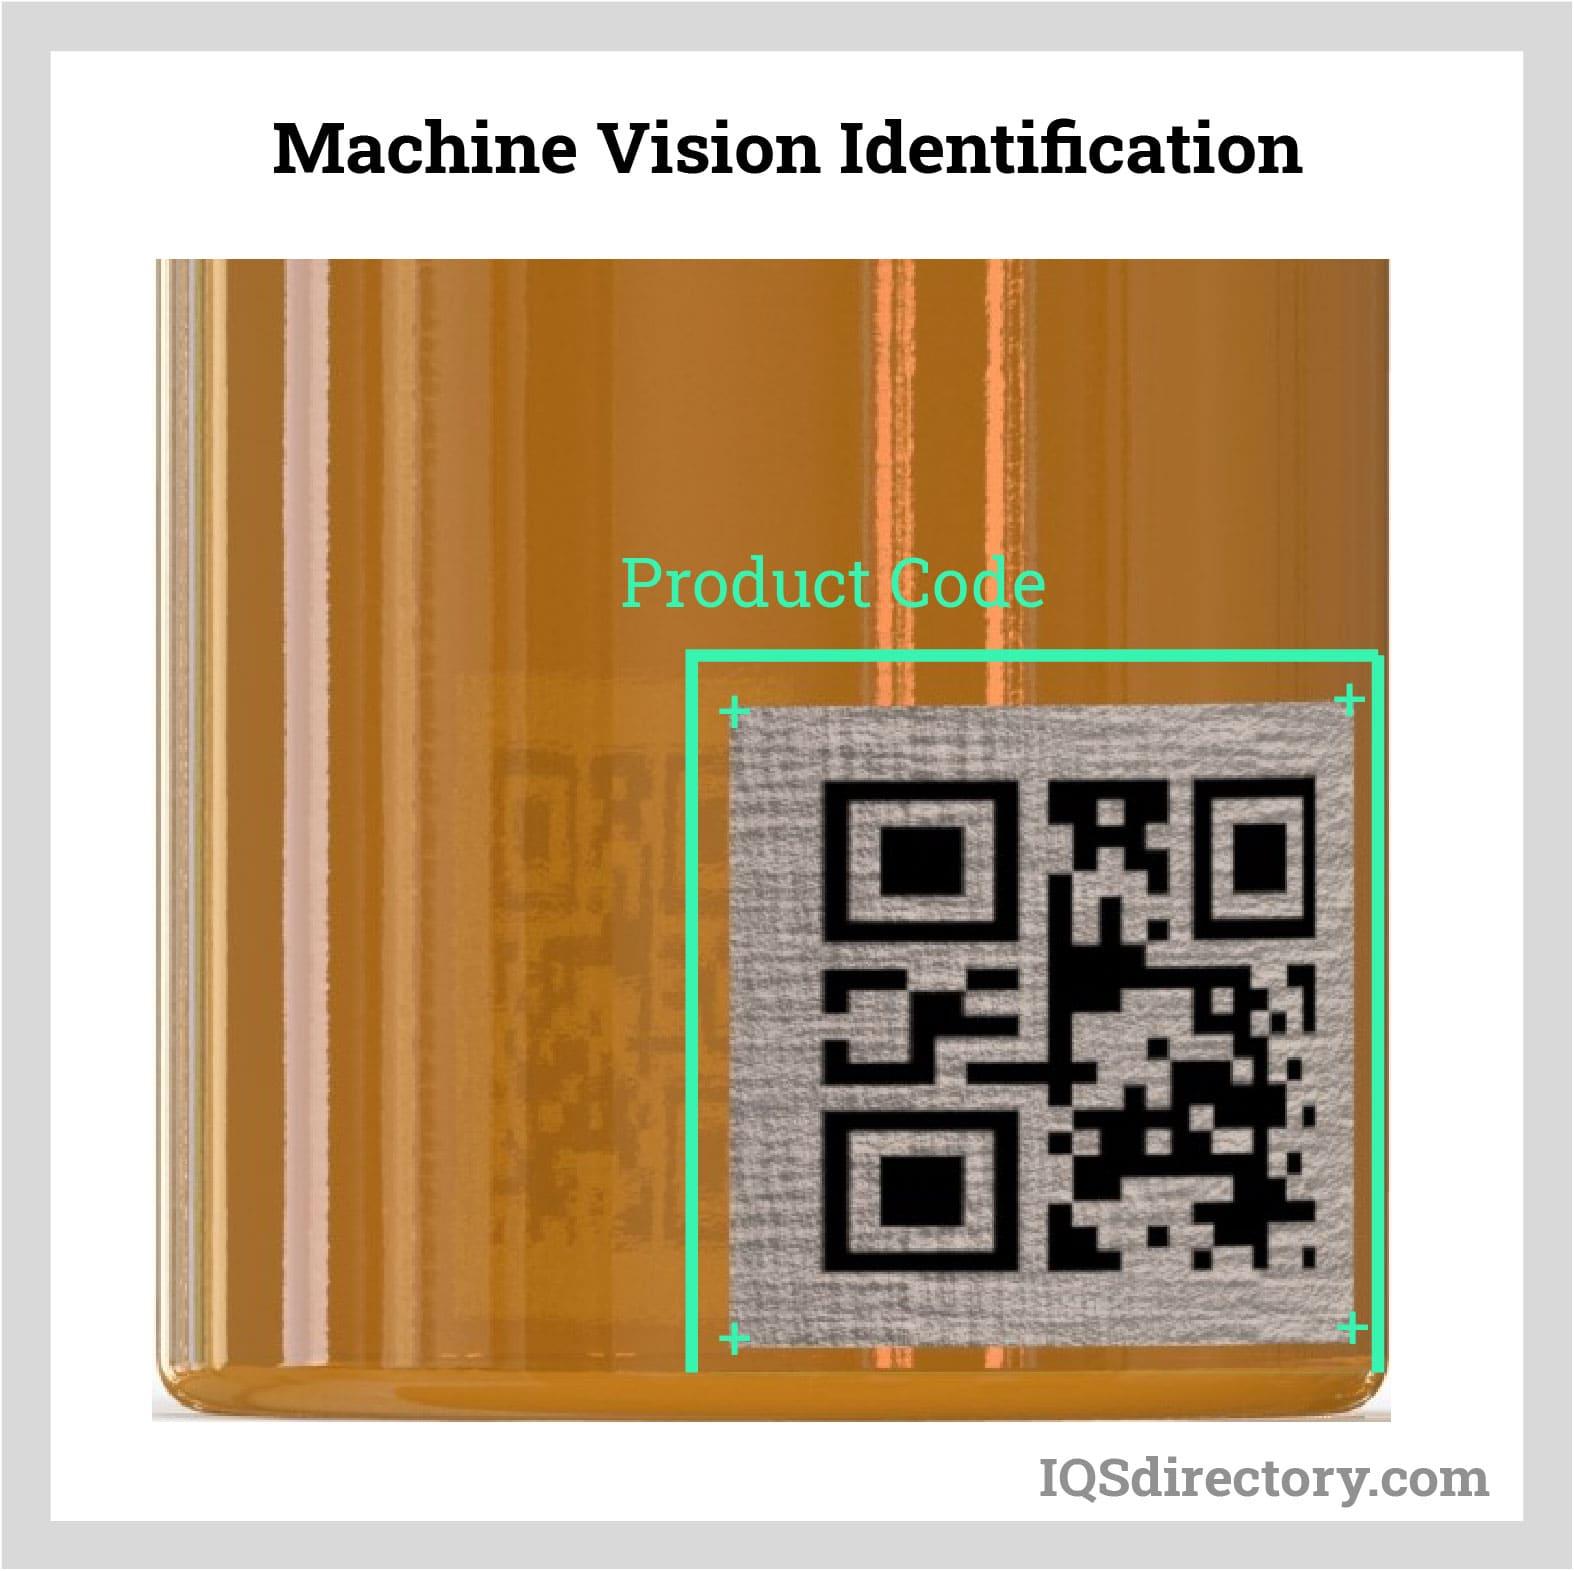 Machine Vision Identification